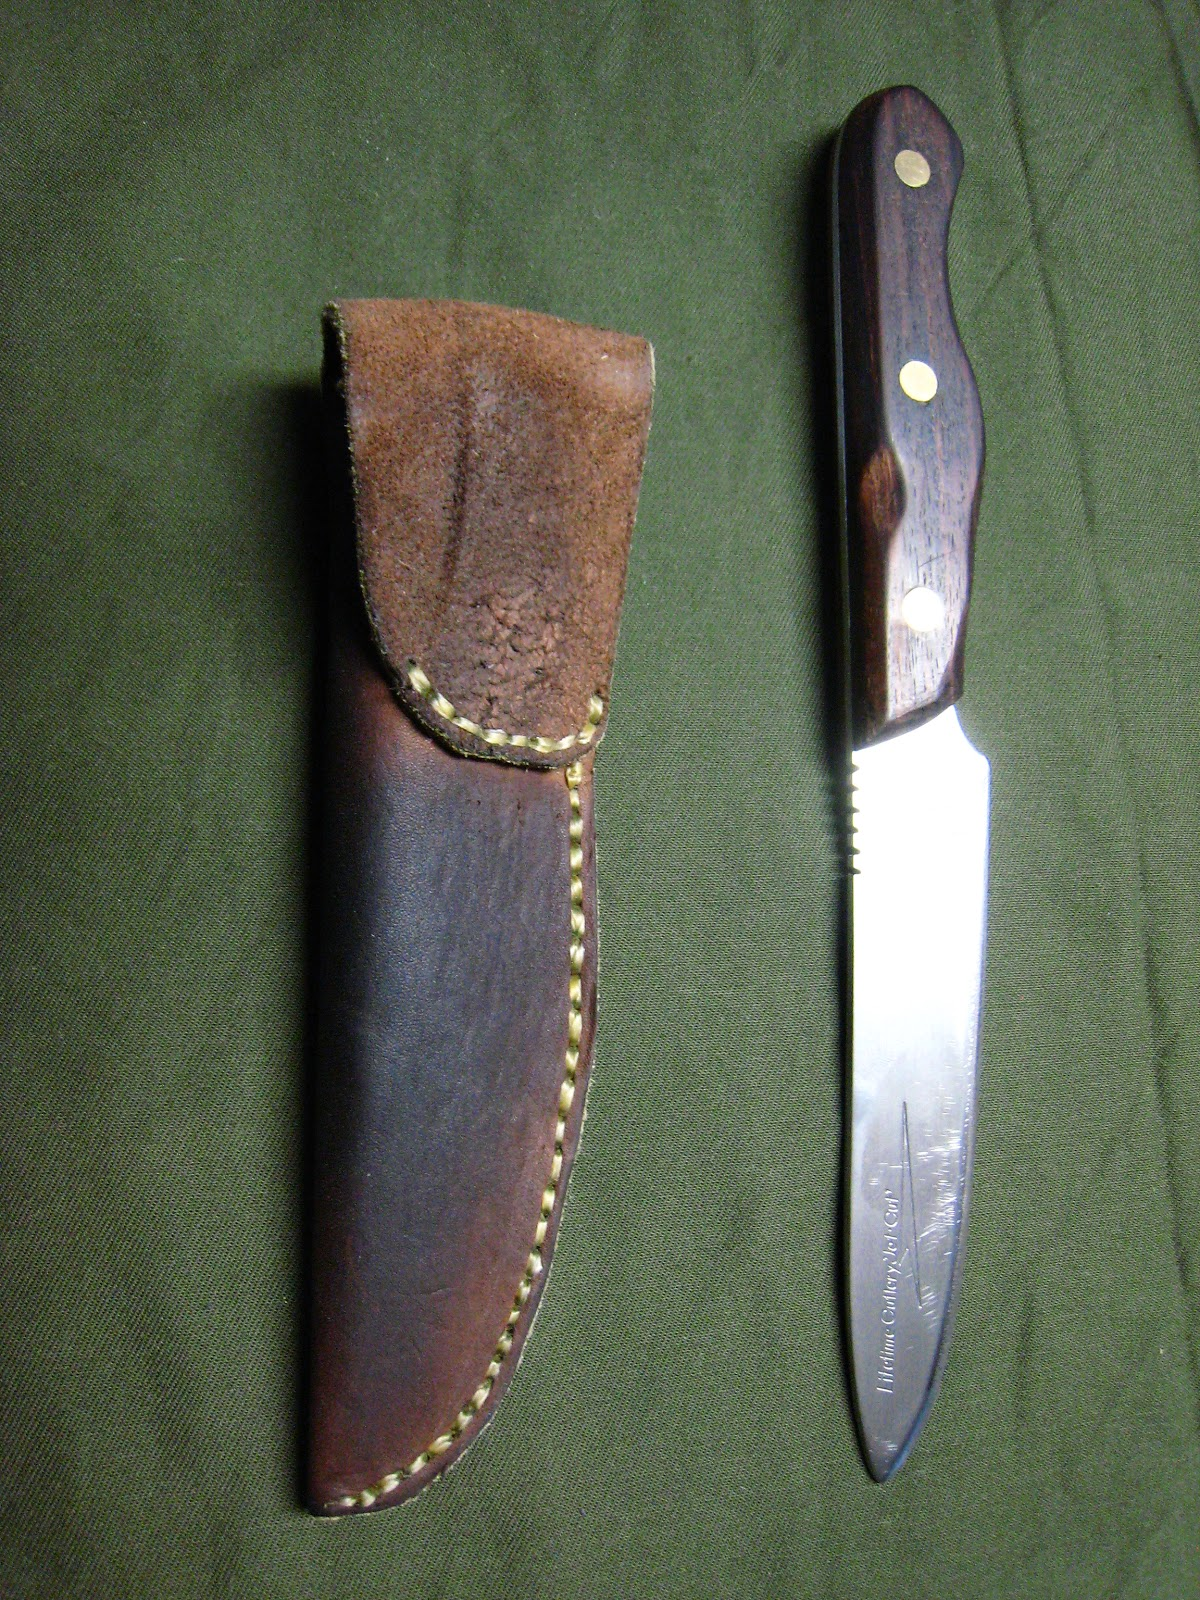 minnesota bushcraft kitchen knife to bushcraft knife mod. Black Bedroom Furniture Sets. Home Design Ideas